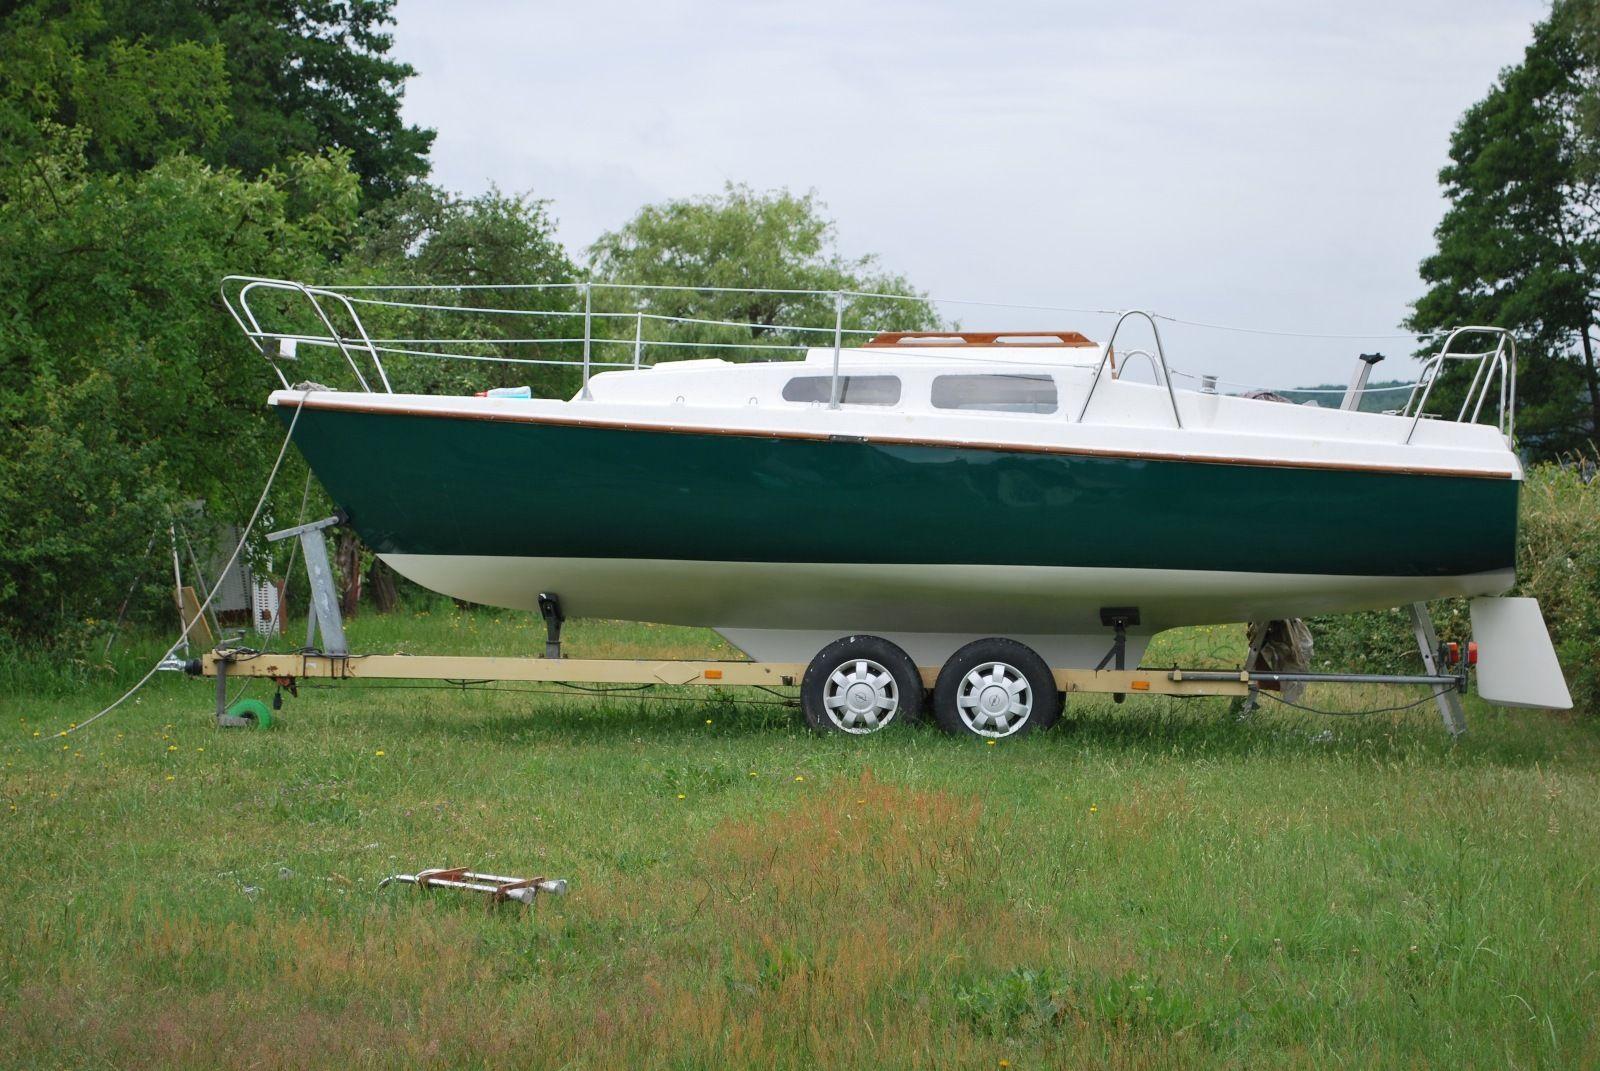 Neptun 22 Kielboot inkl Elektro und 4 Taktmotor, Trailer